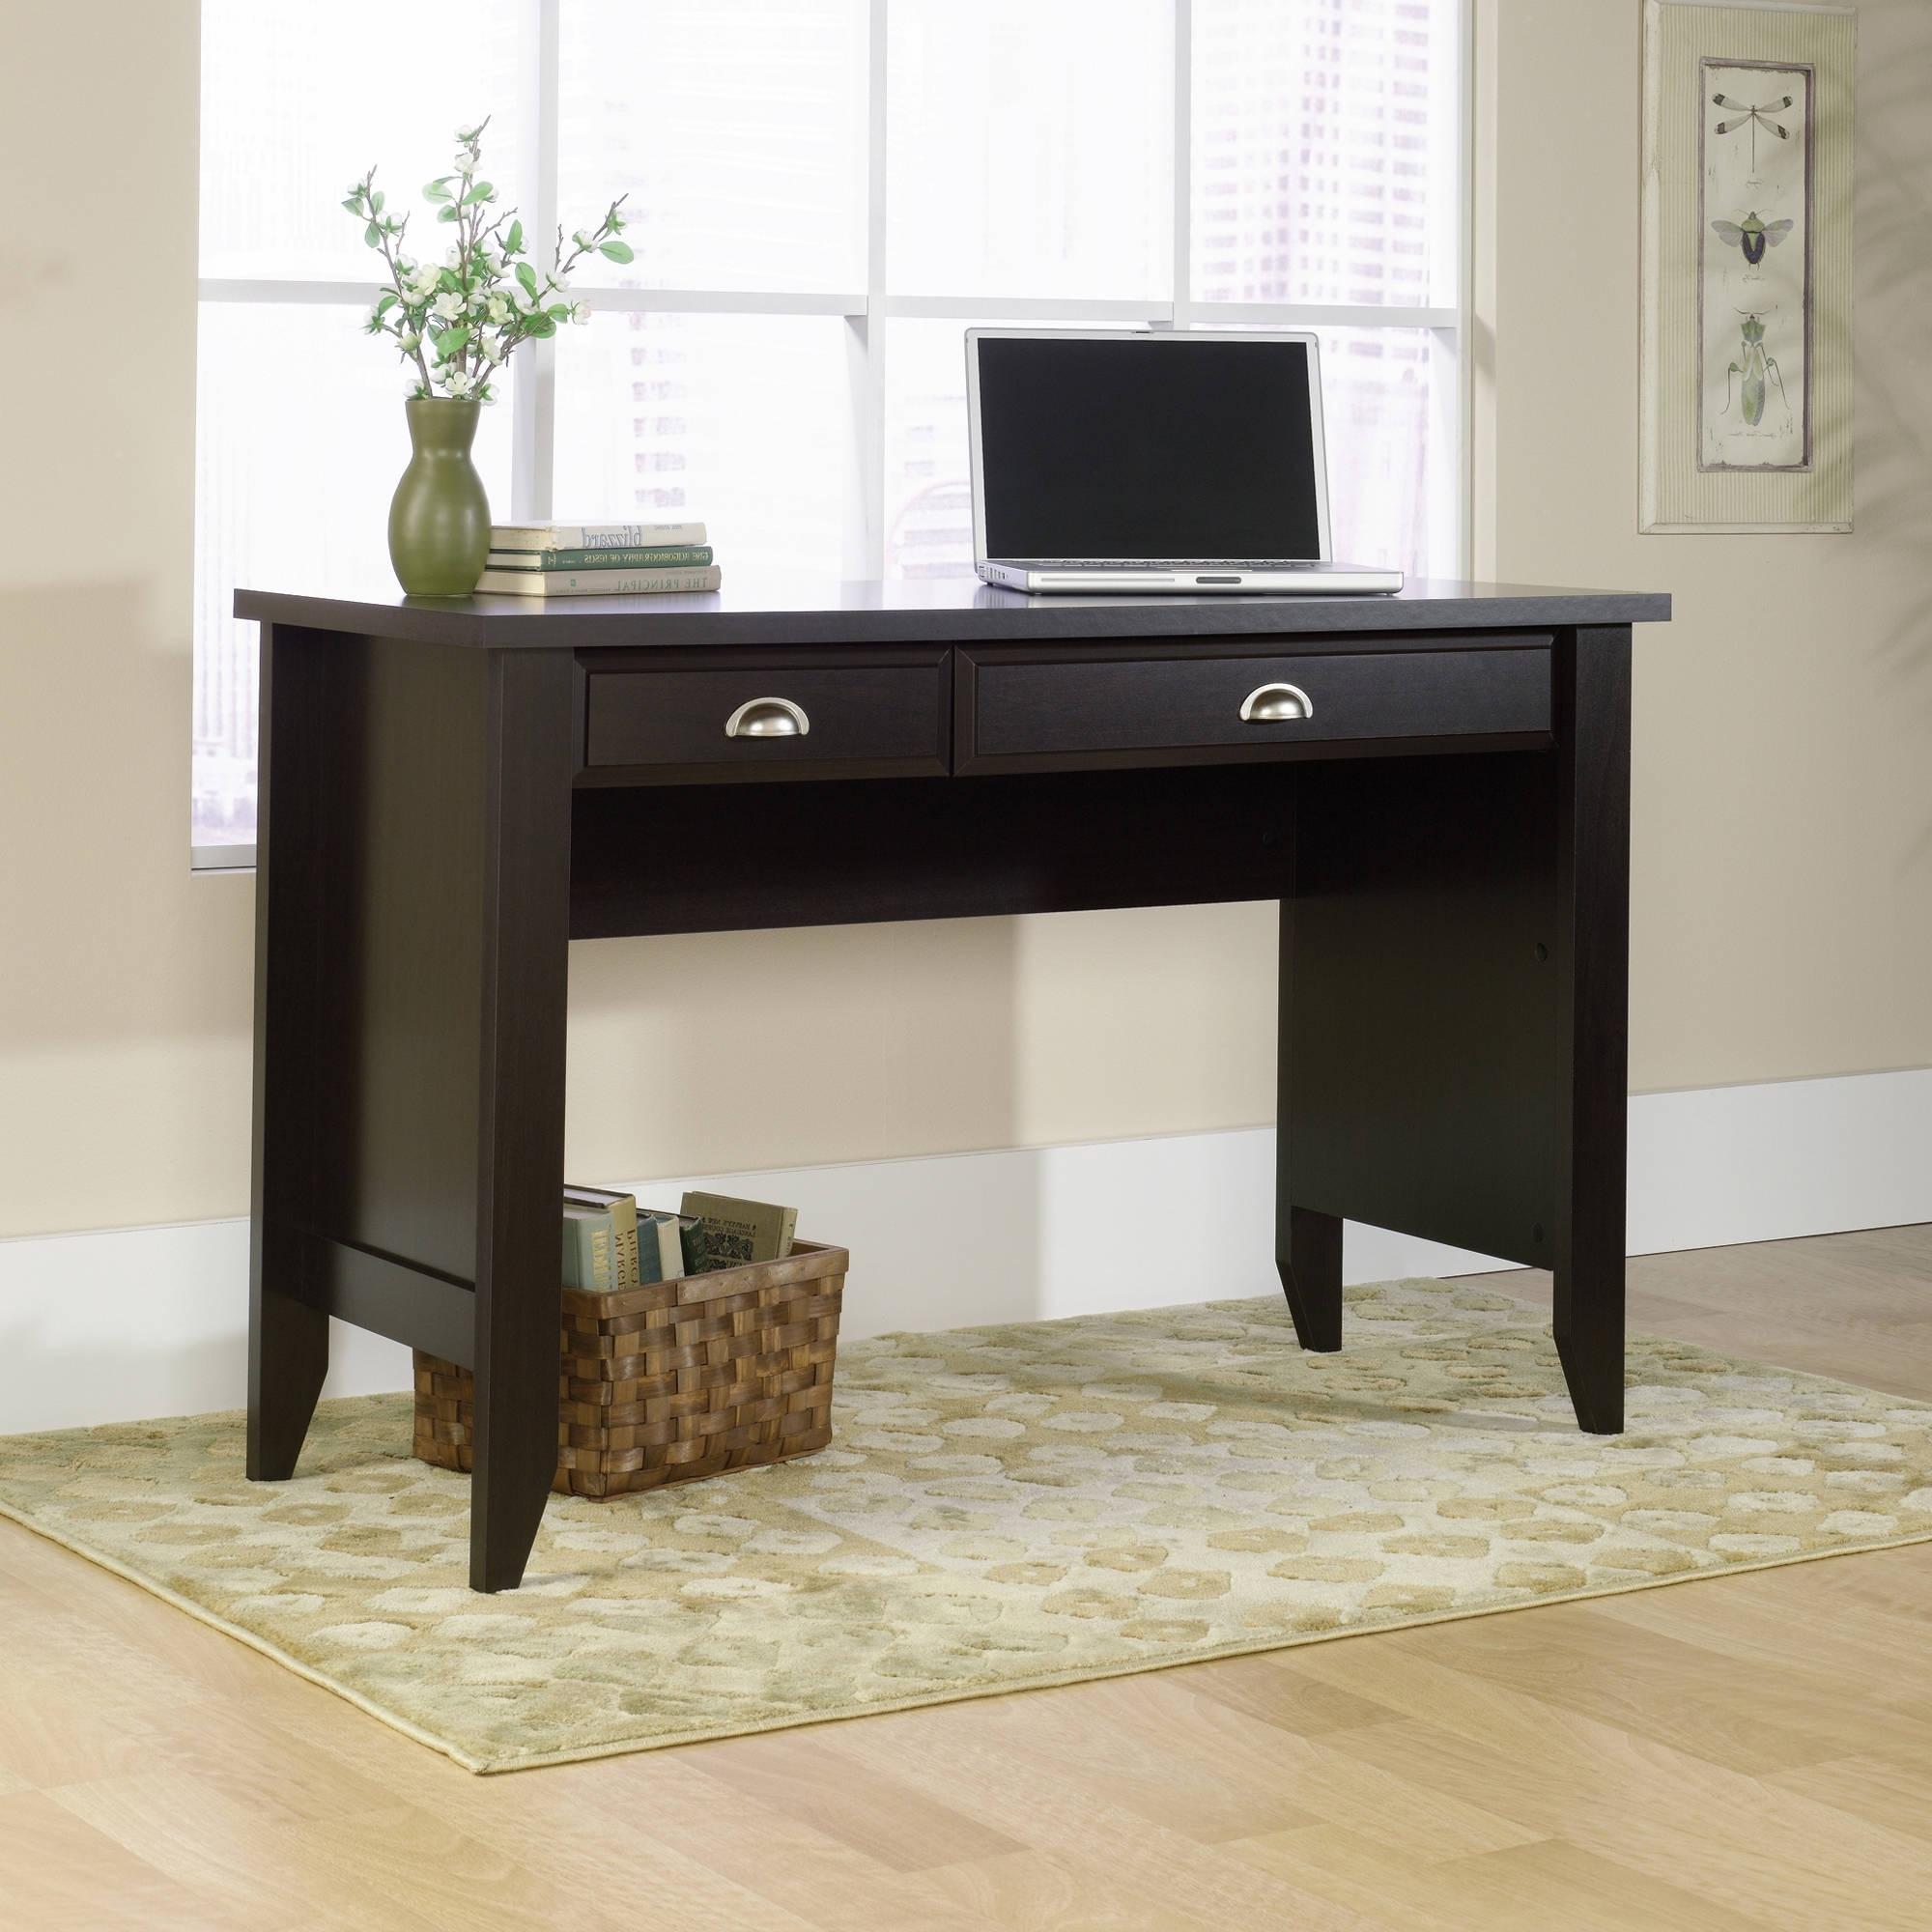 Computer Desks At Walmart In Preferred Sauder Shoal Creek Computer Desk In Multiple Colors – Walmart (View 4 of 20)